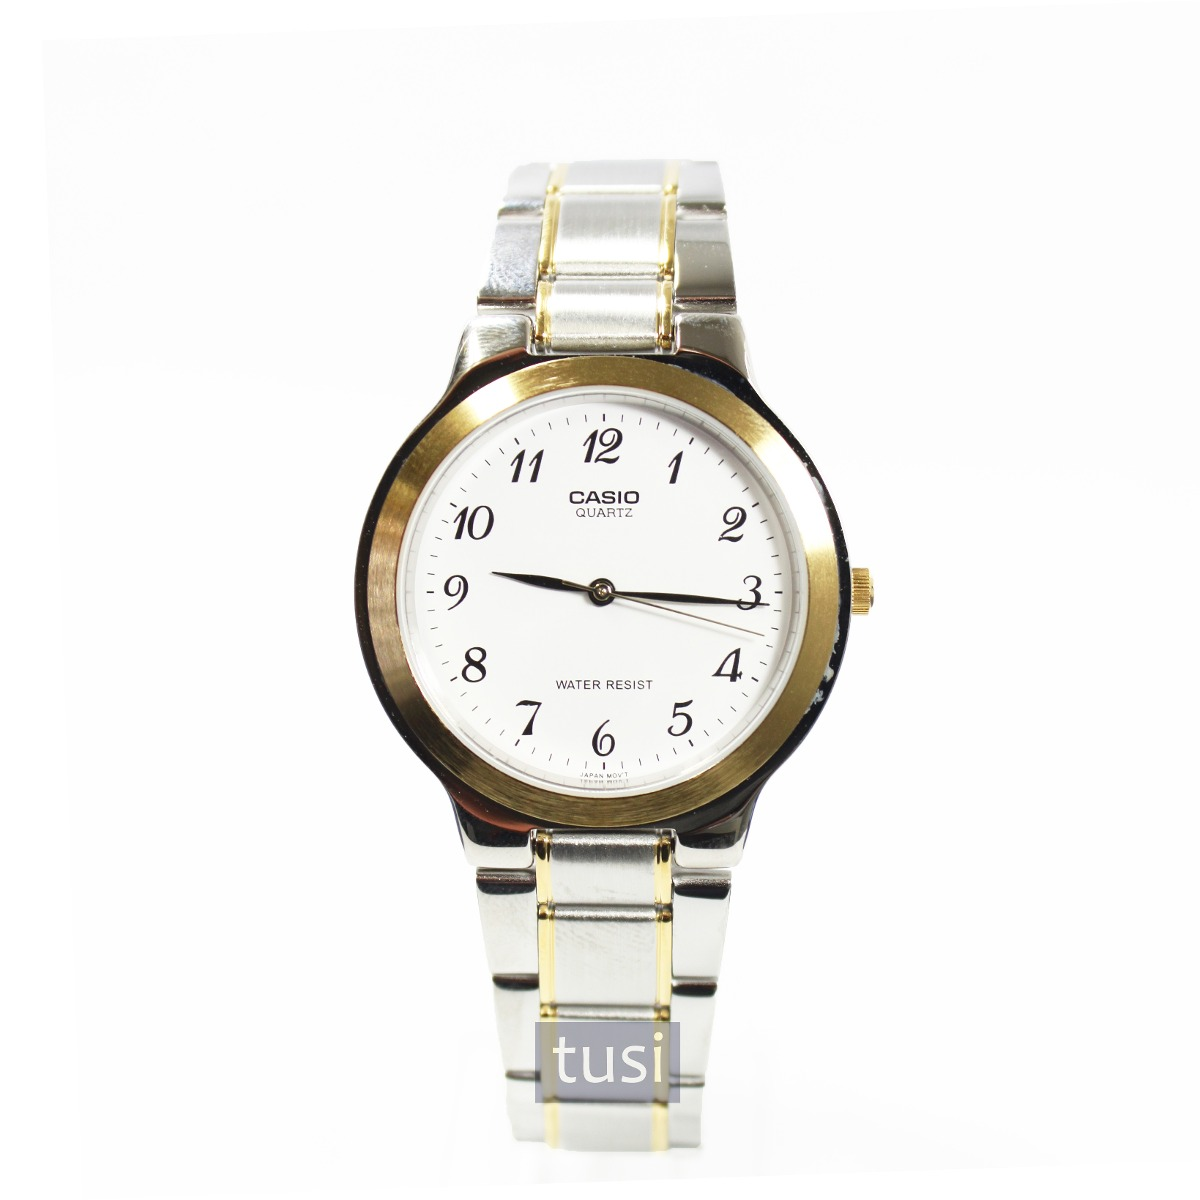 902d35879162 relojes hublot mercadolibre colombia